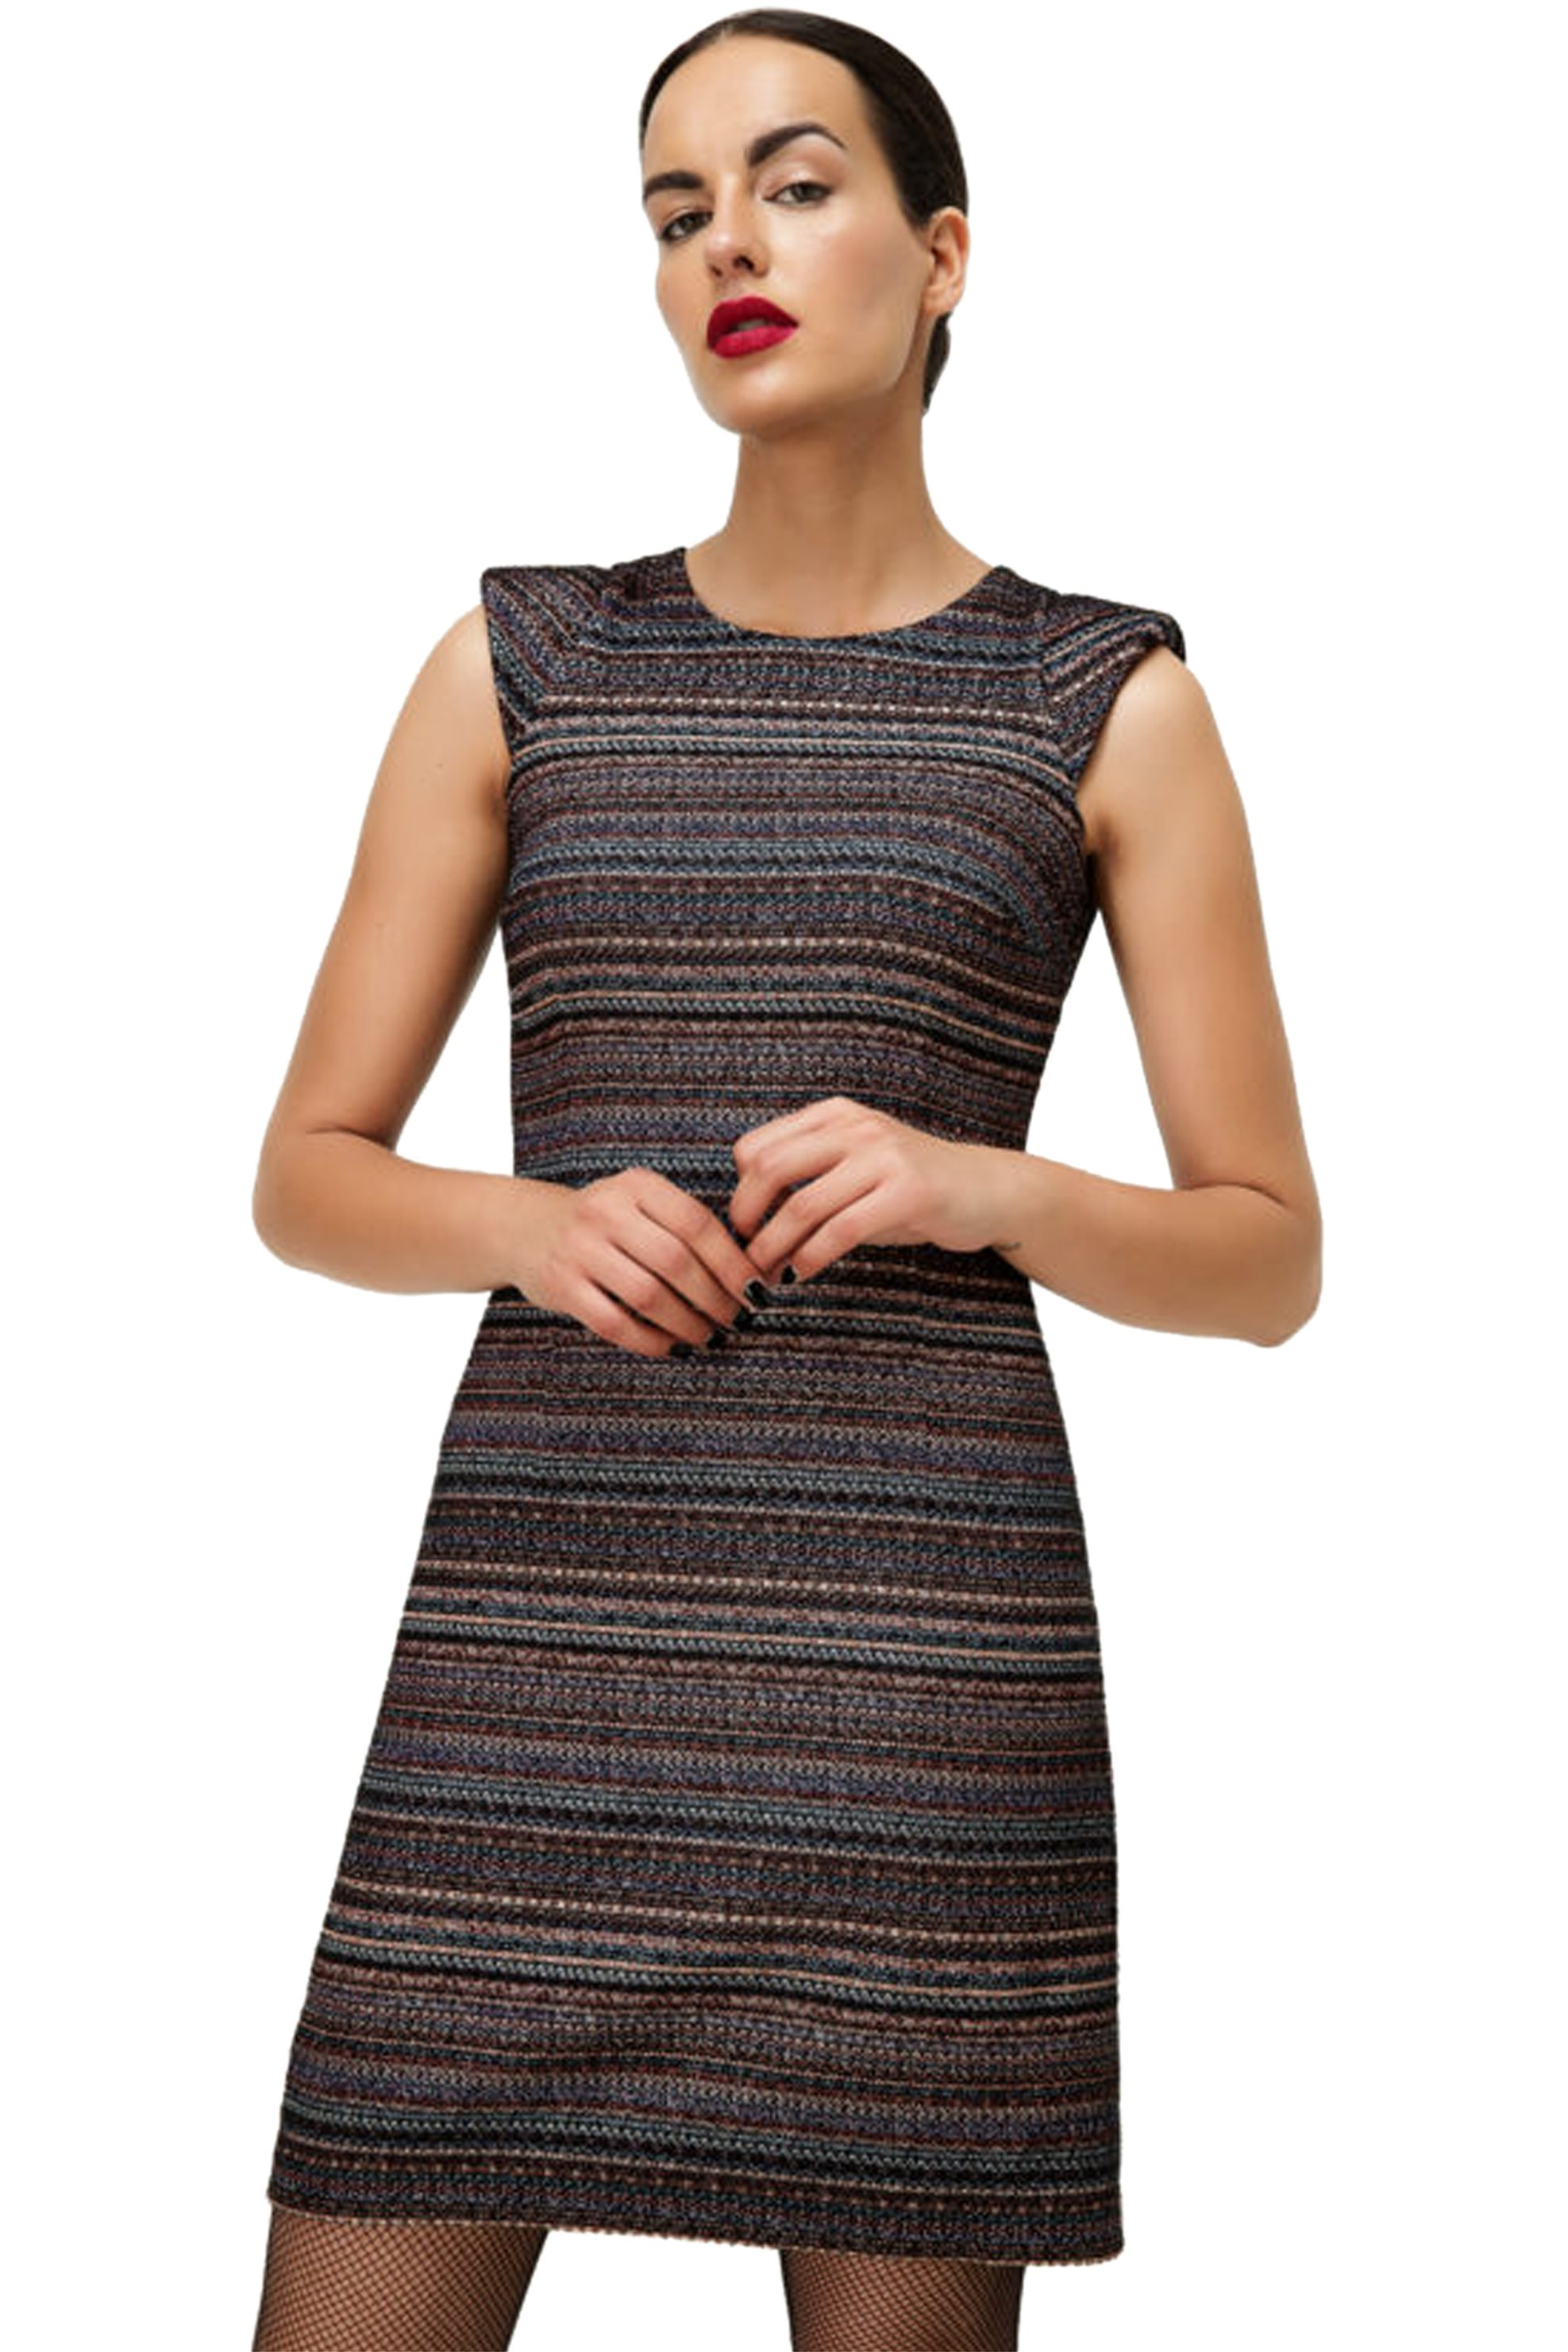 45e047a3776e Billy Sabbado γυναικείο μίνι φόρεμα tweed - 0141910554 - Μαύρο